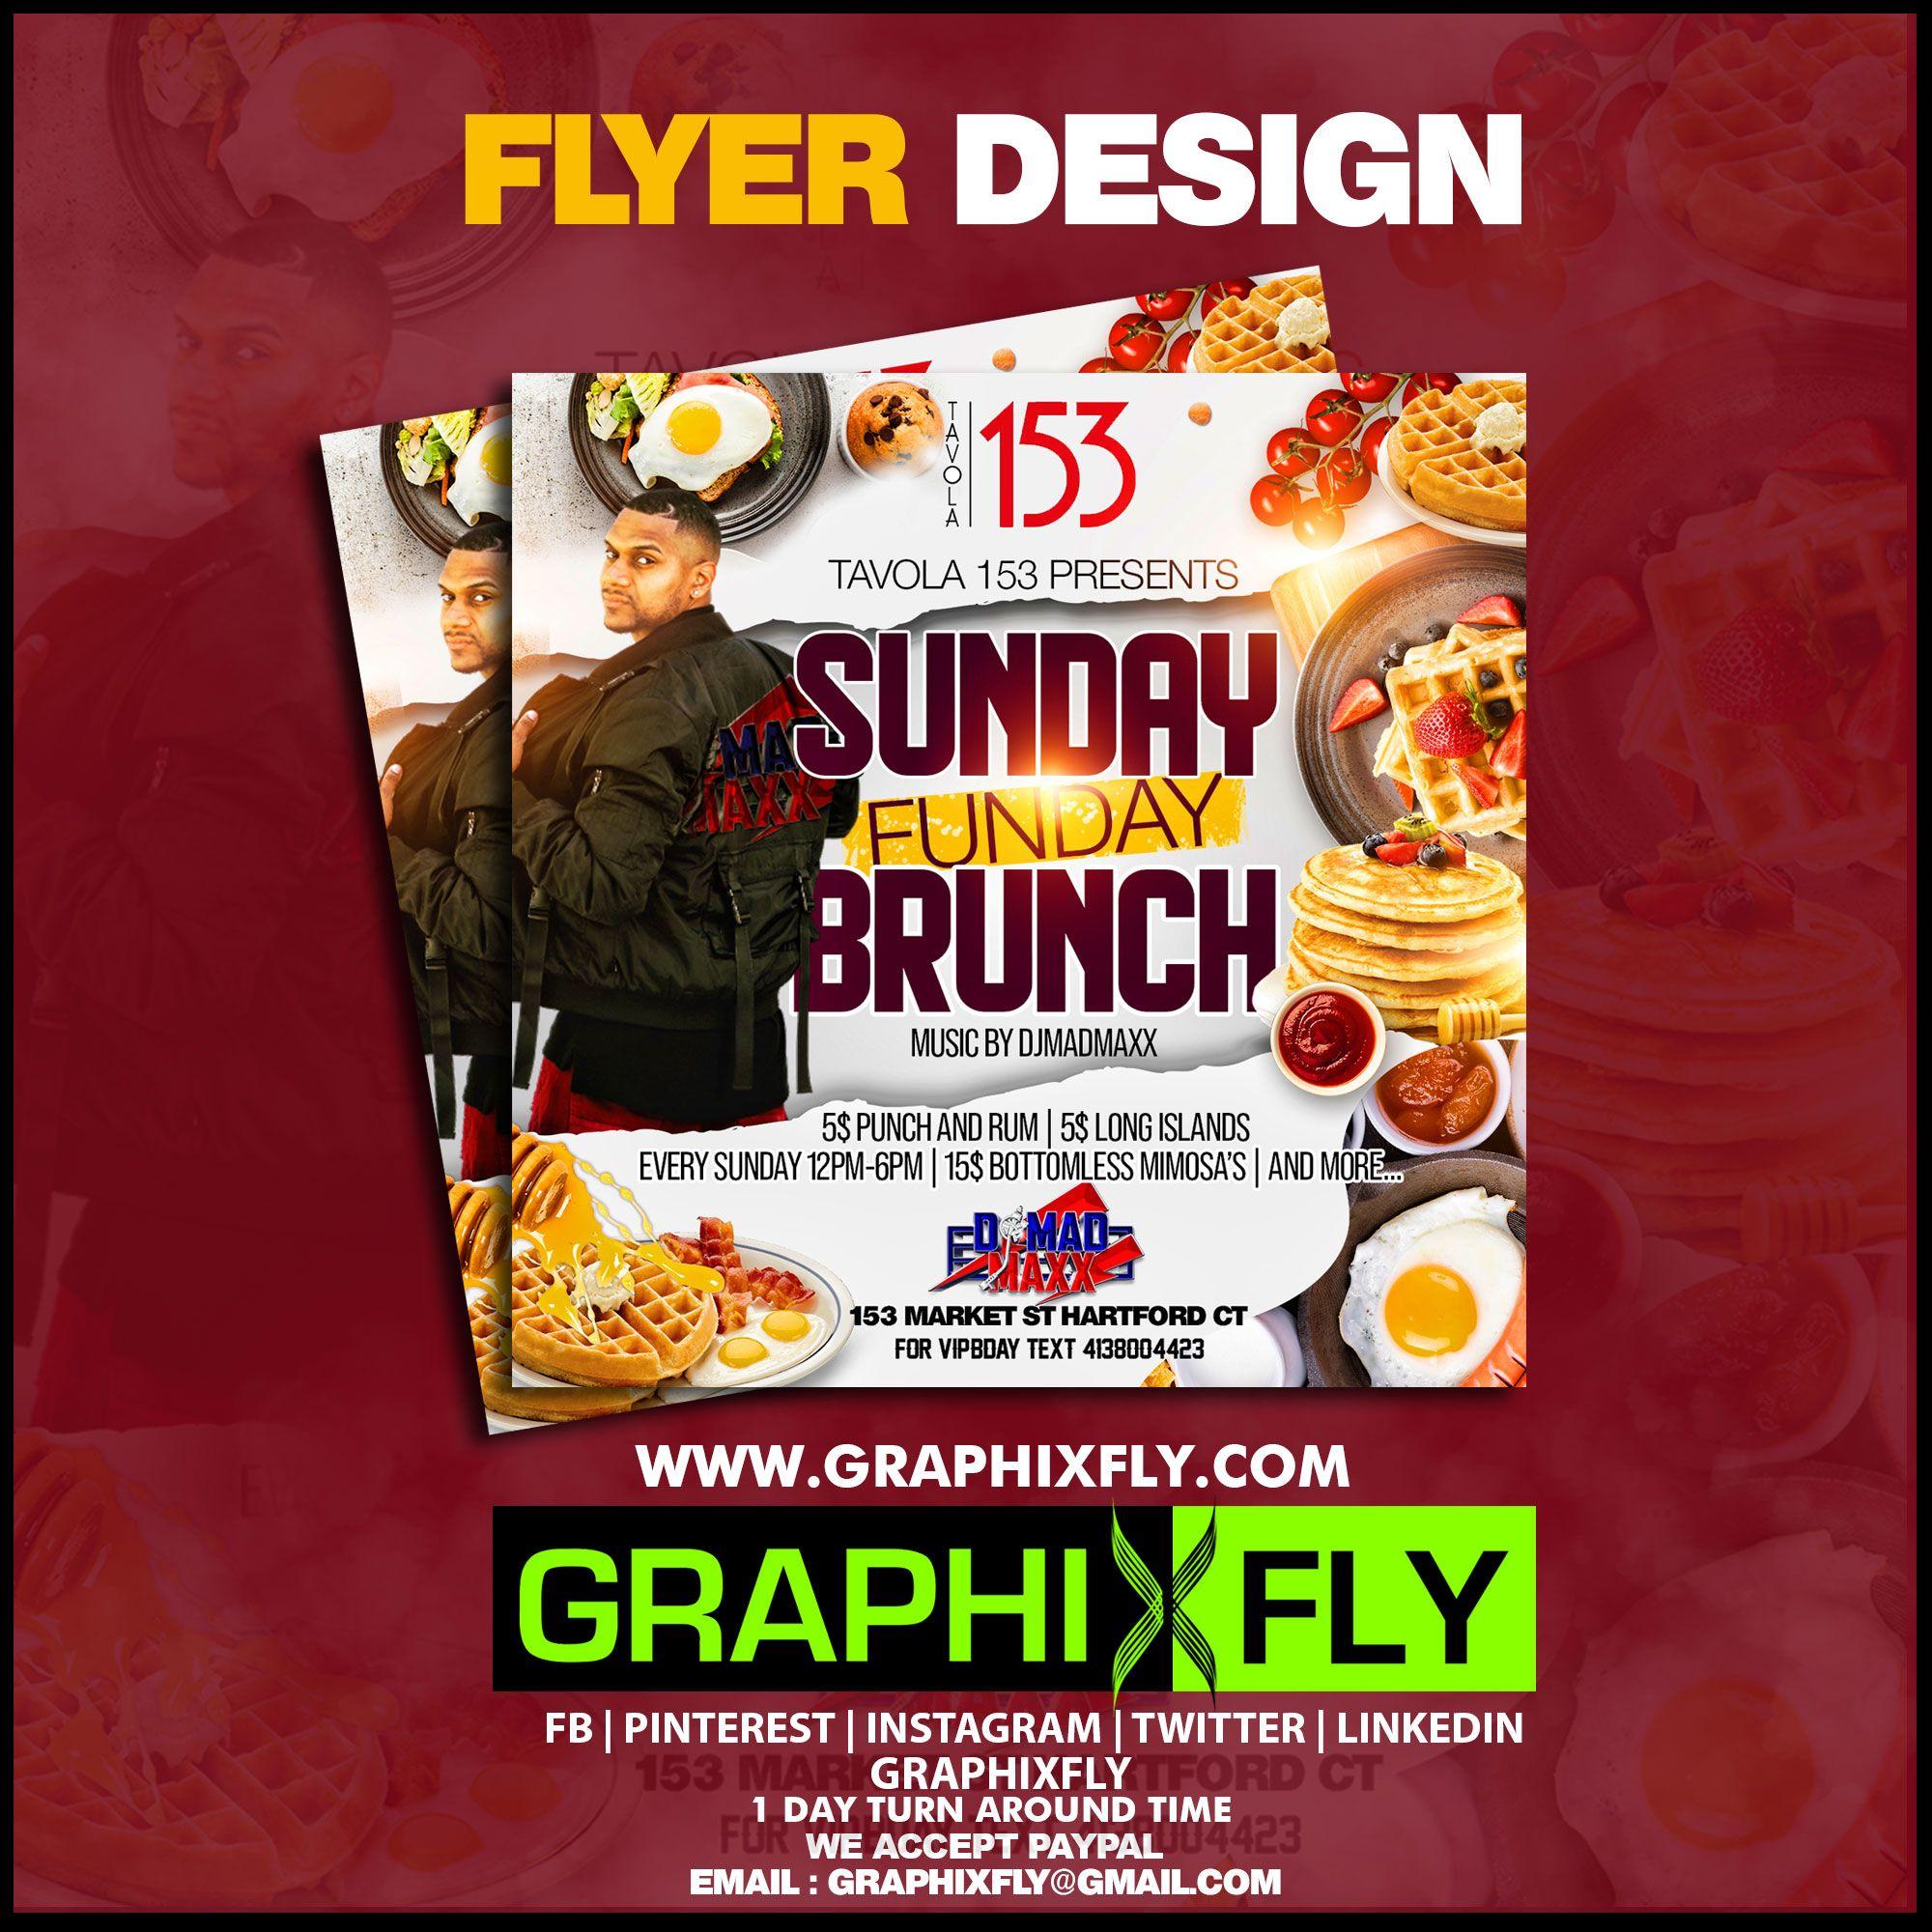 Sunday Funday Brunch Flyer Designed By Graphixfly In 2020 Flyer Design Creative Graphic Design Creative Design Services